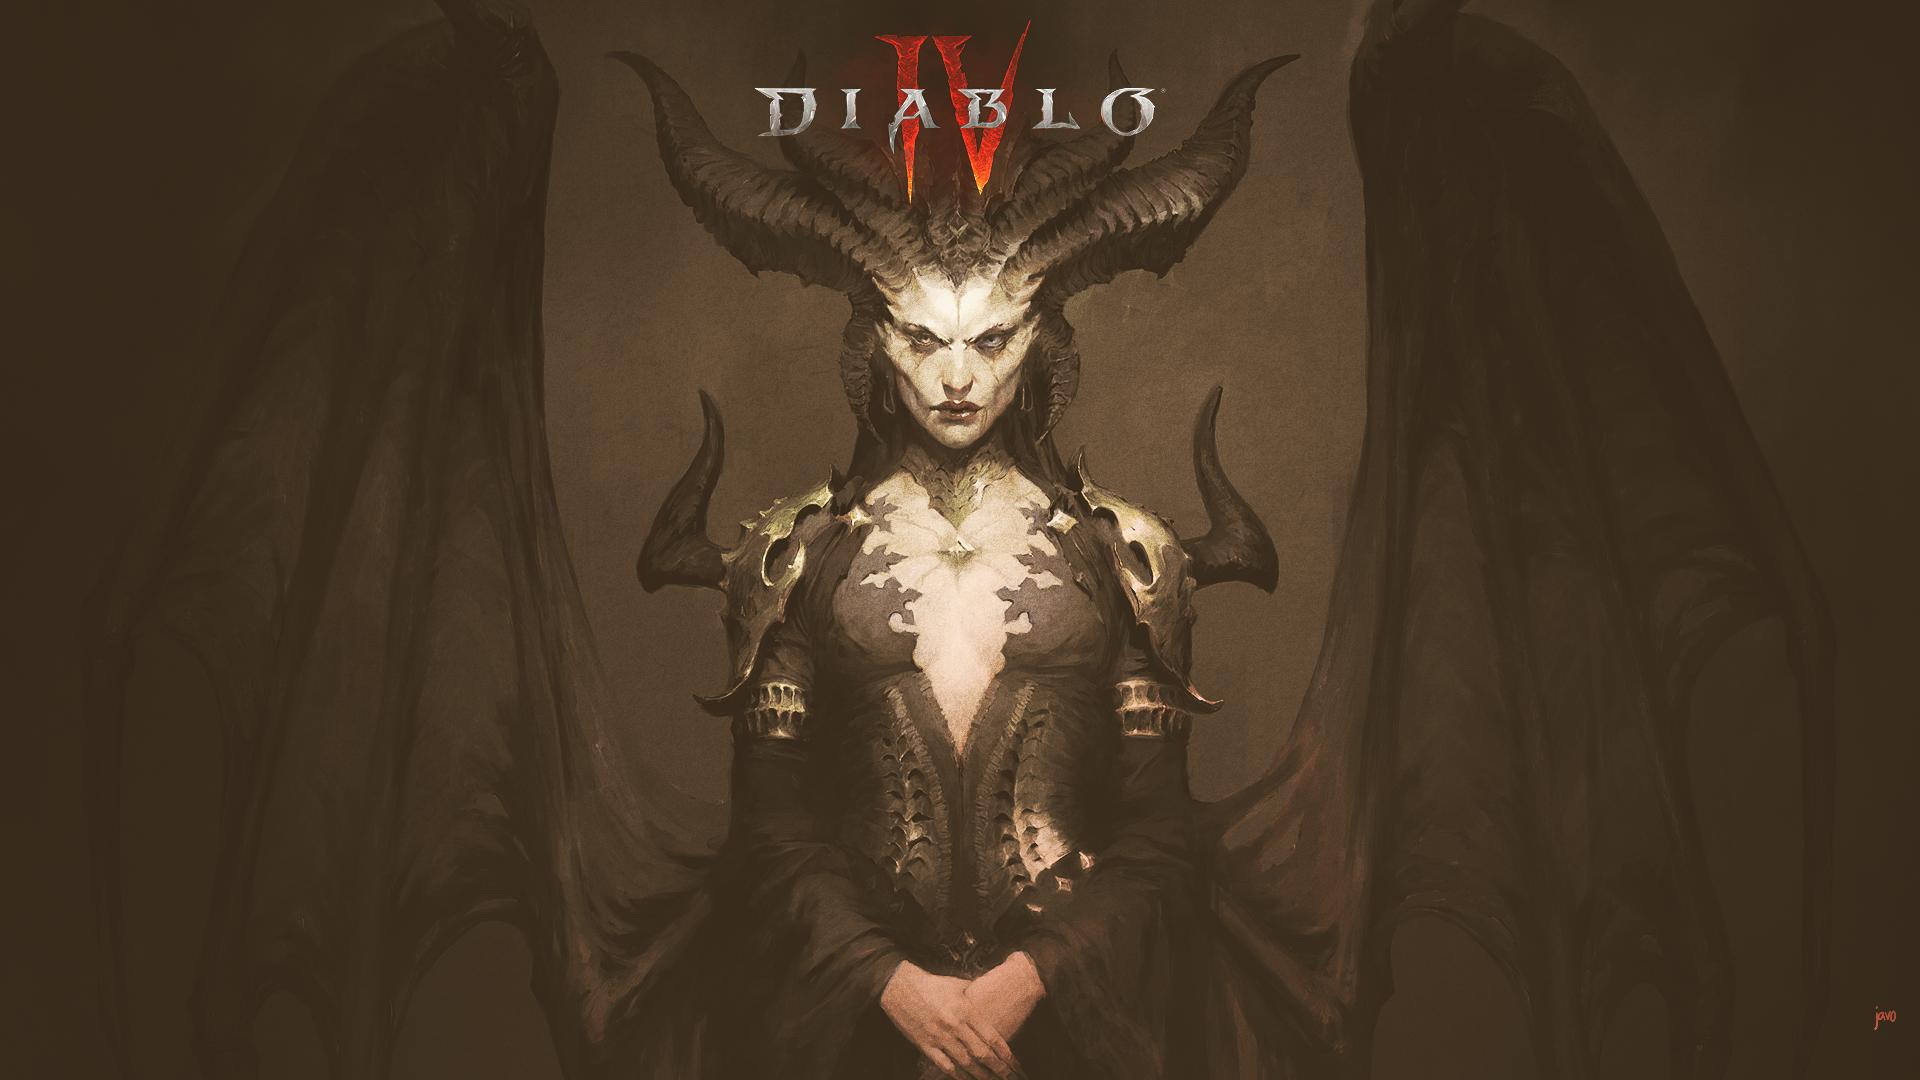 General 1920x1080 diablo 4 diablo iv Diablo RPG Lilith Lilith (Diablo) sanctuary javo Blizzard Entertainment BlizzCon frontal view